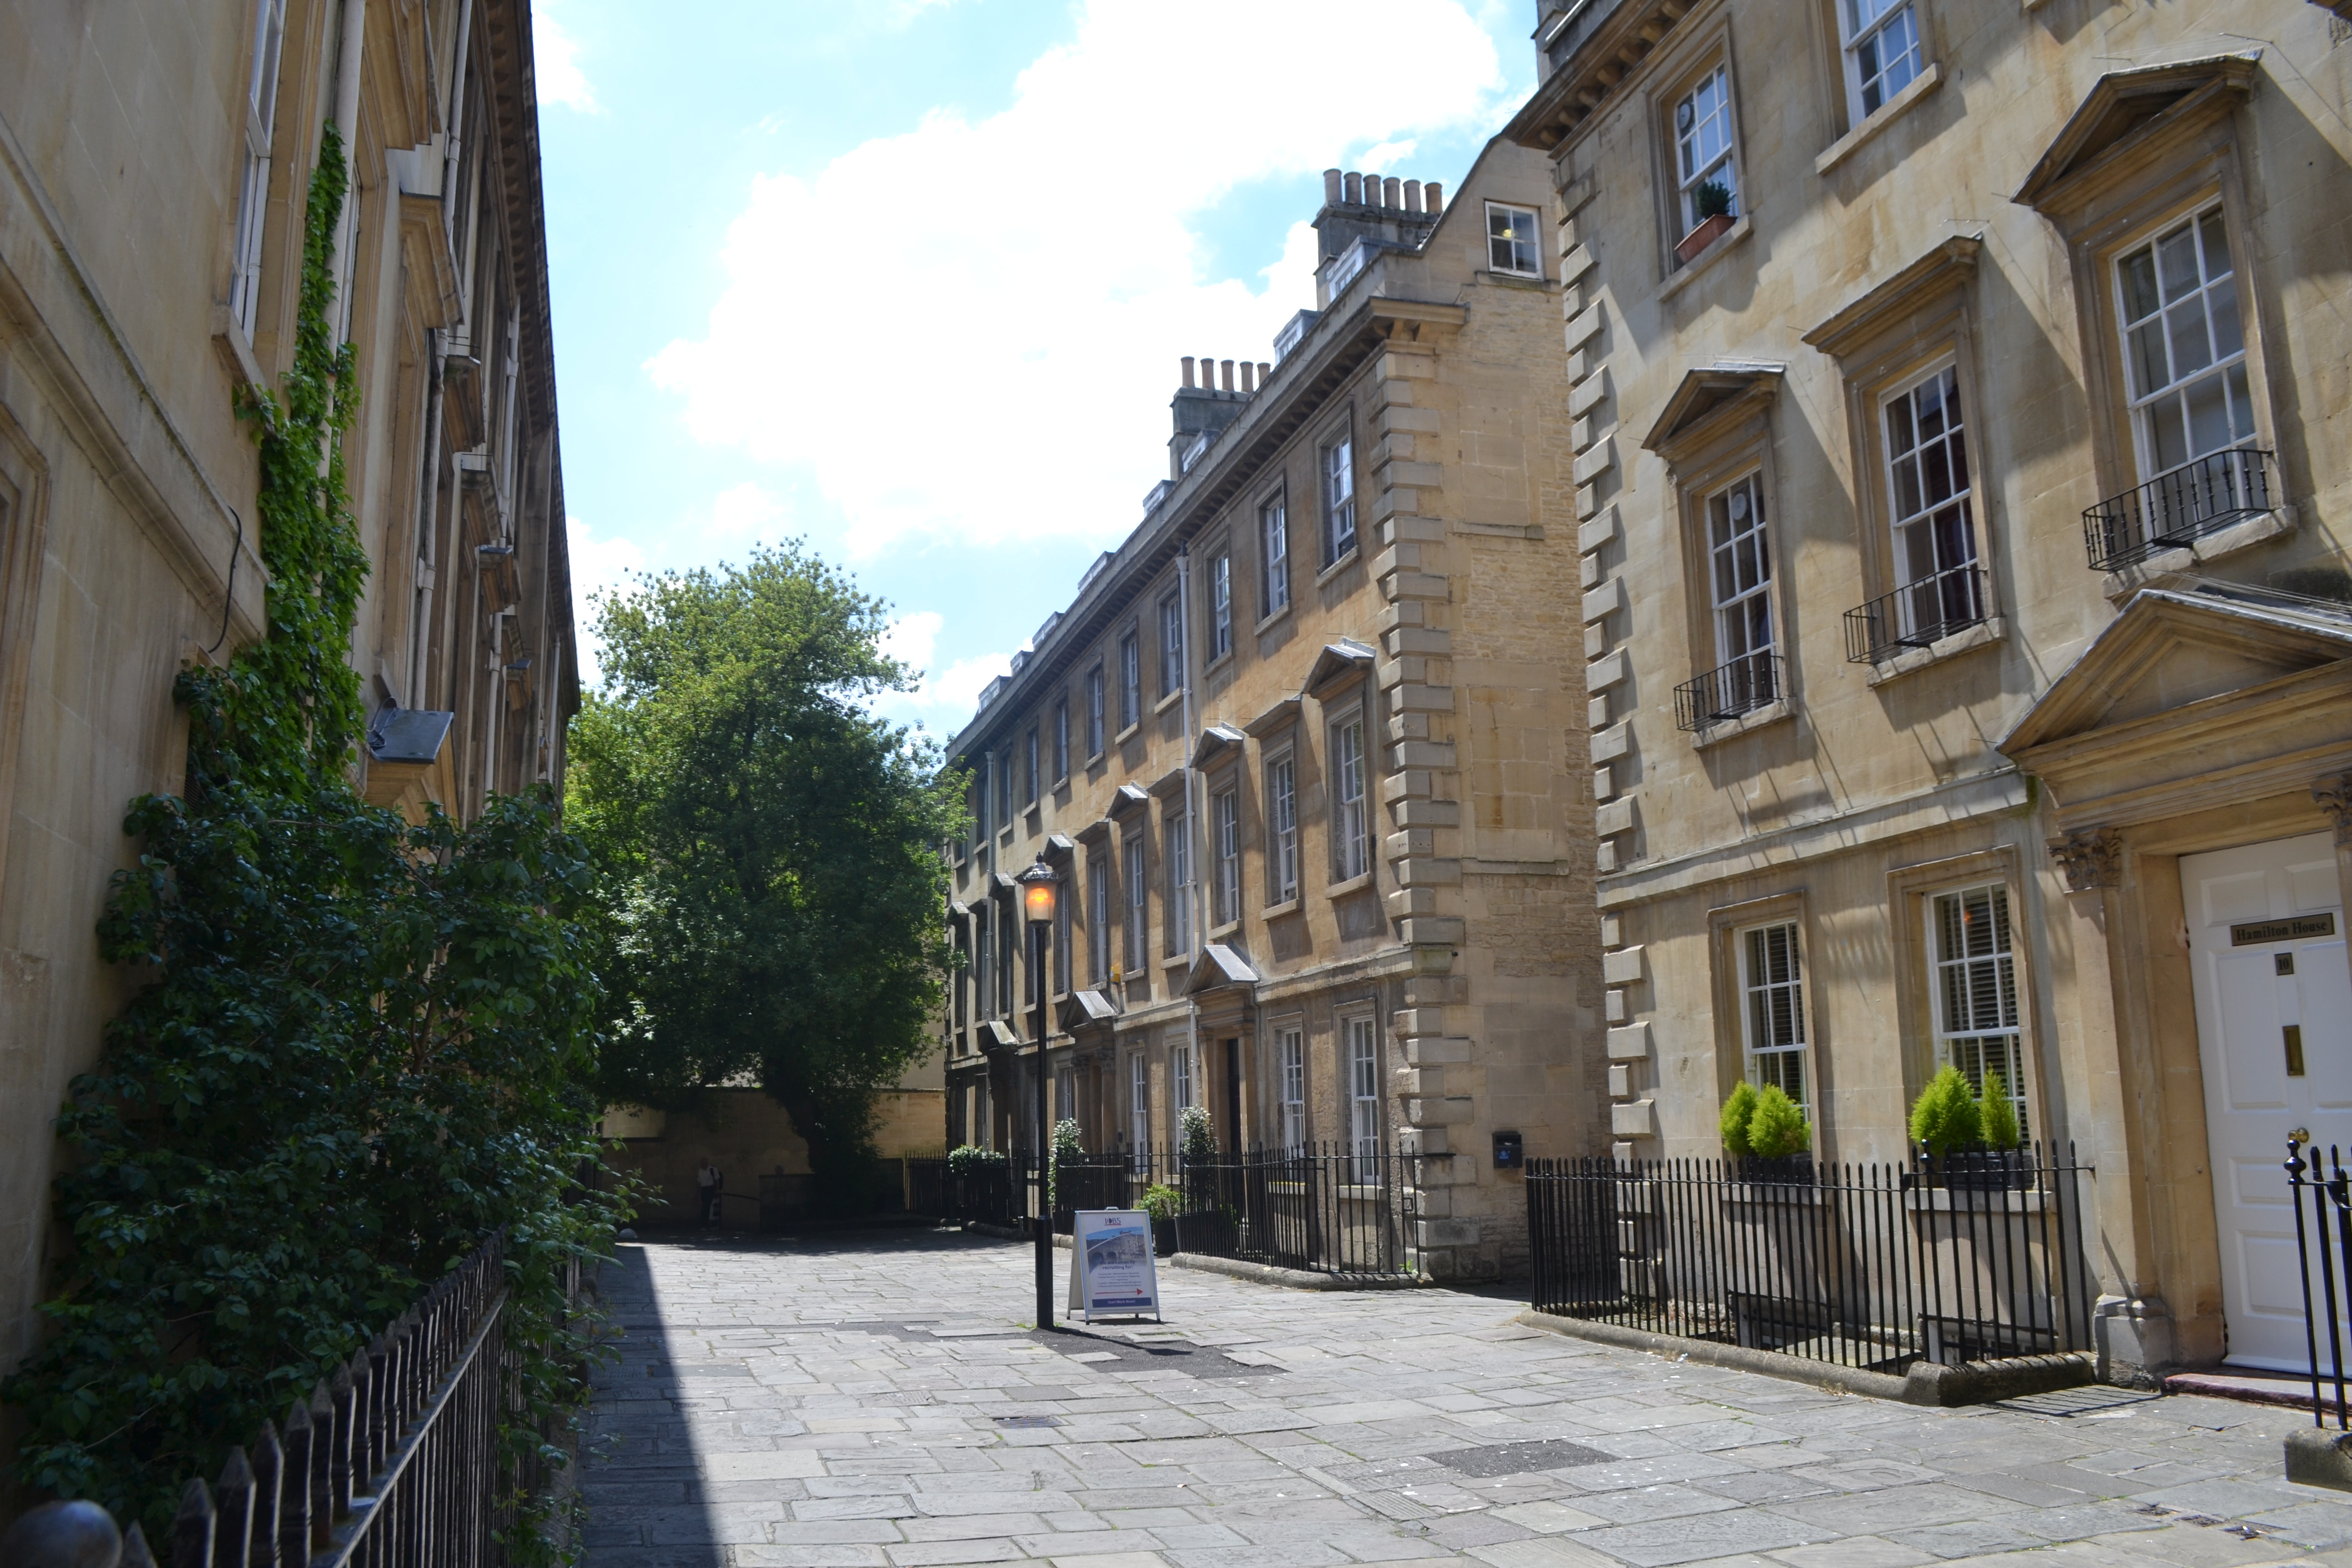 Bath - Englands Historic Cities